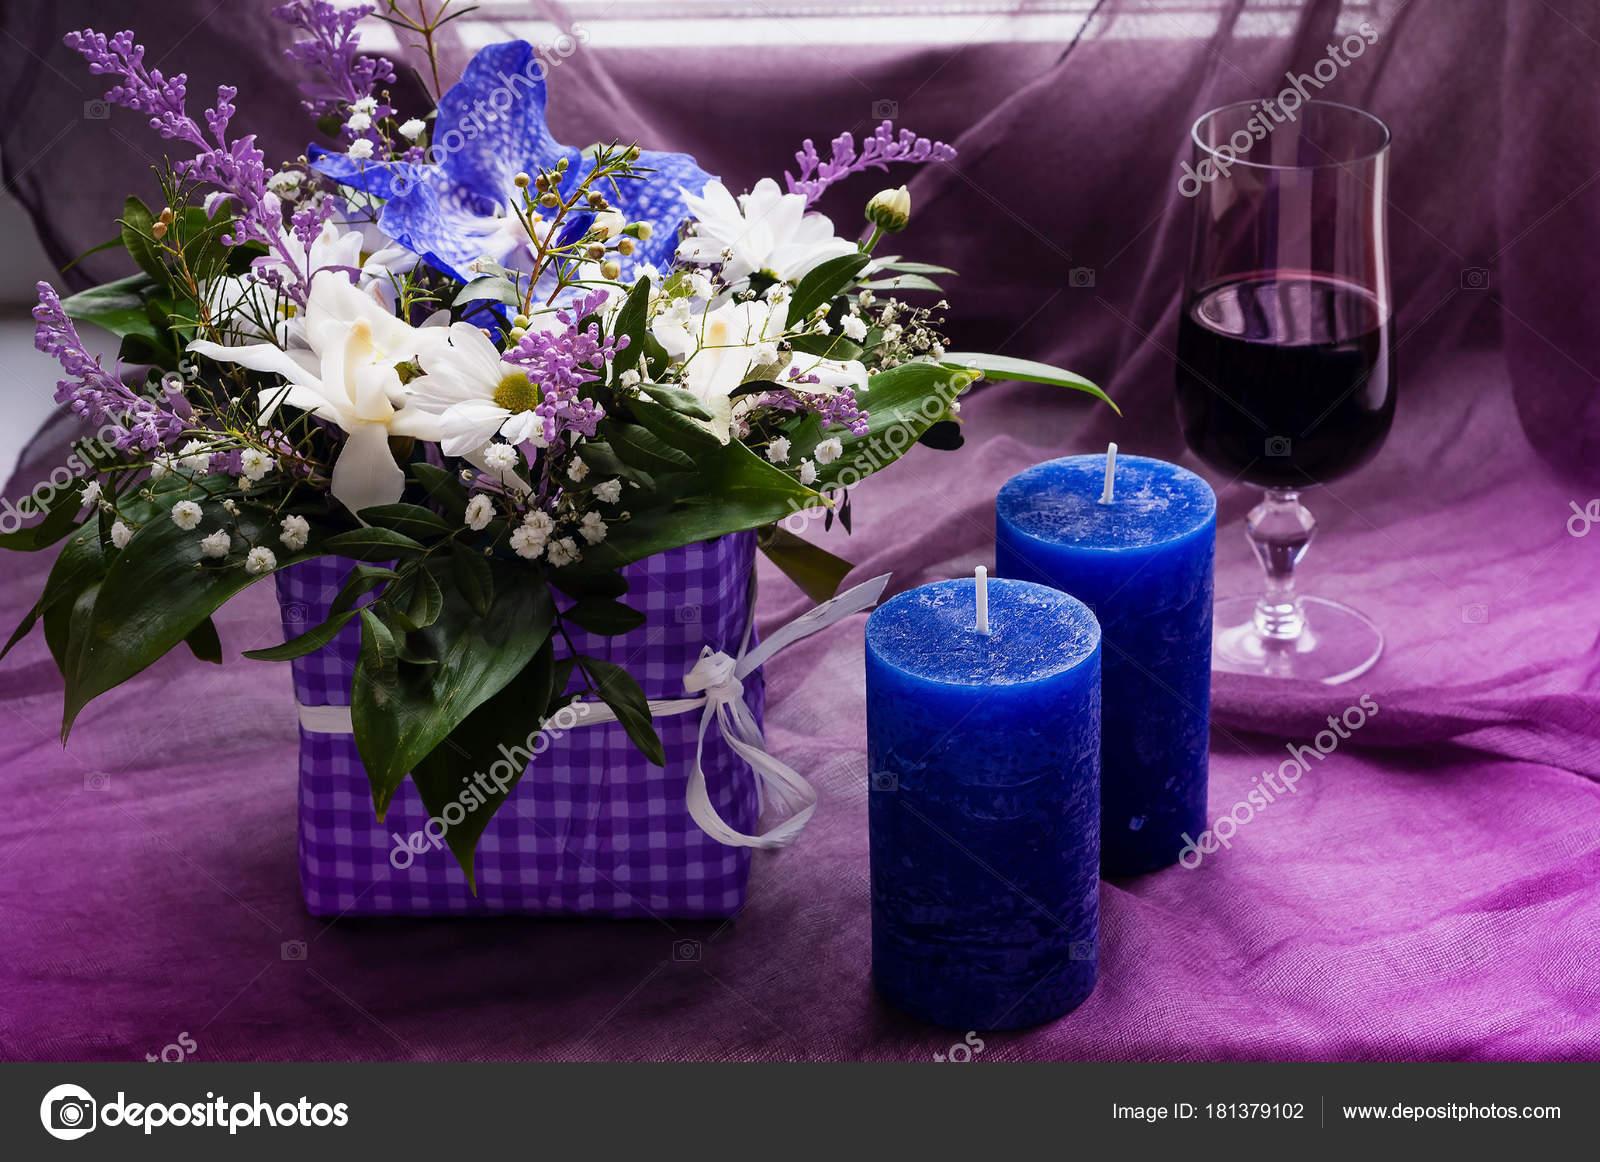 e5cc02e087d ανθοδέσμη από ανοιξιάτικα λουλούδια και μπλε κεριά με ένα ποτήρι ...